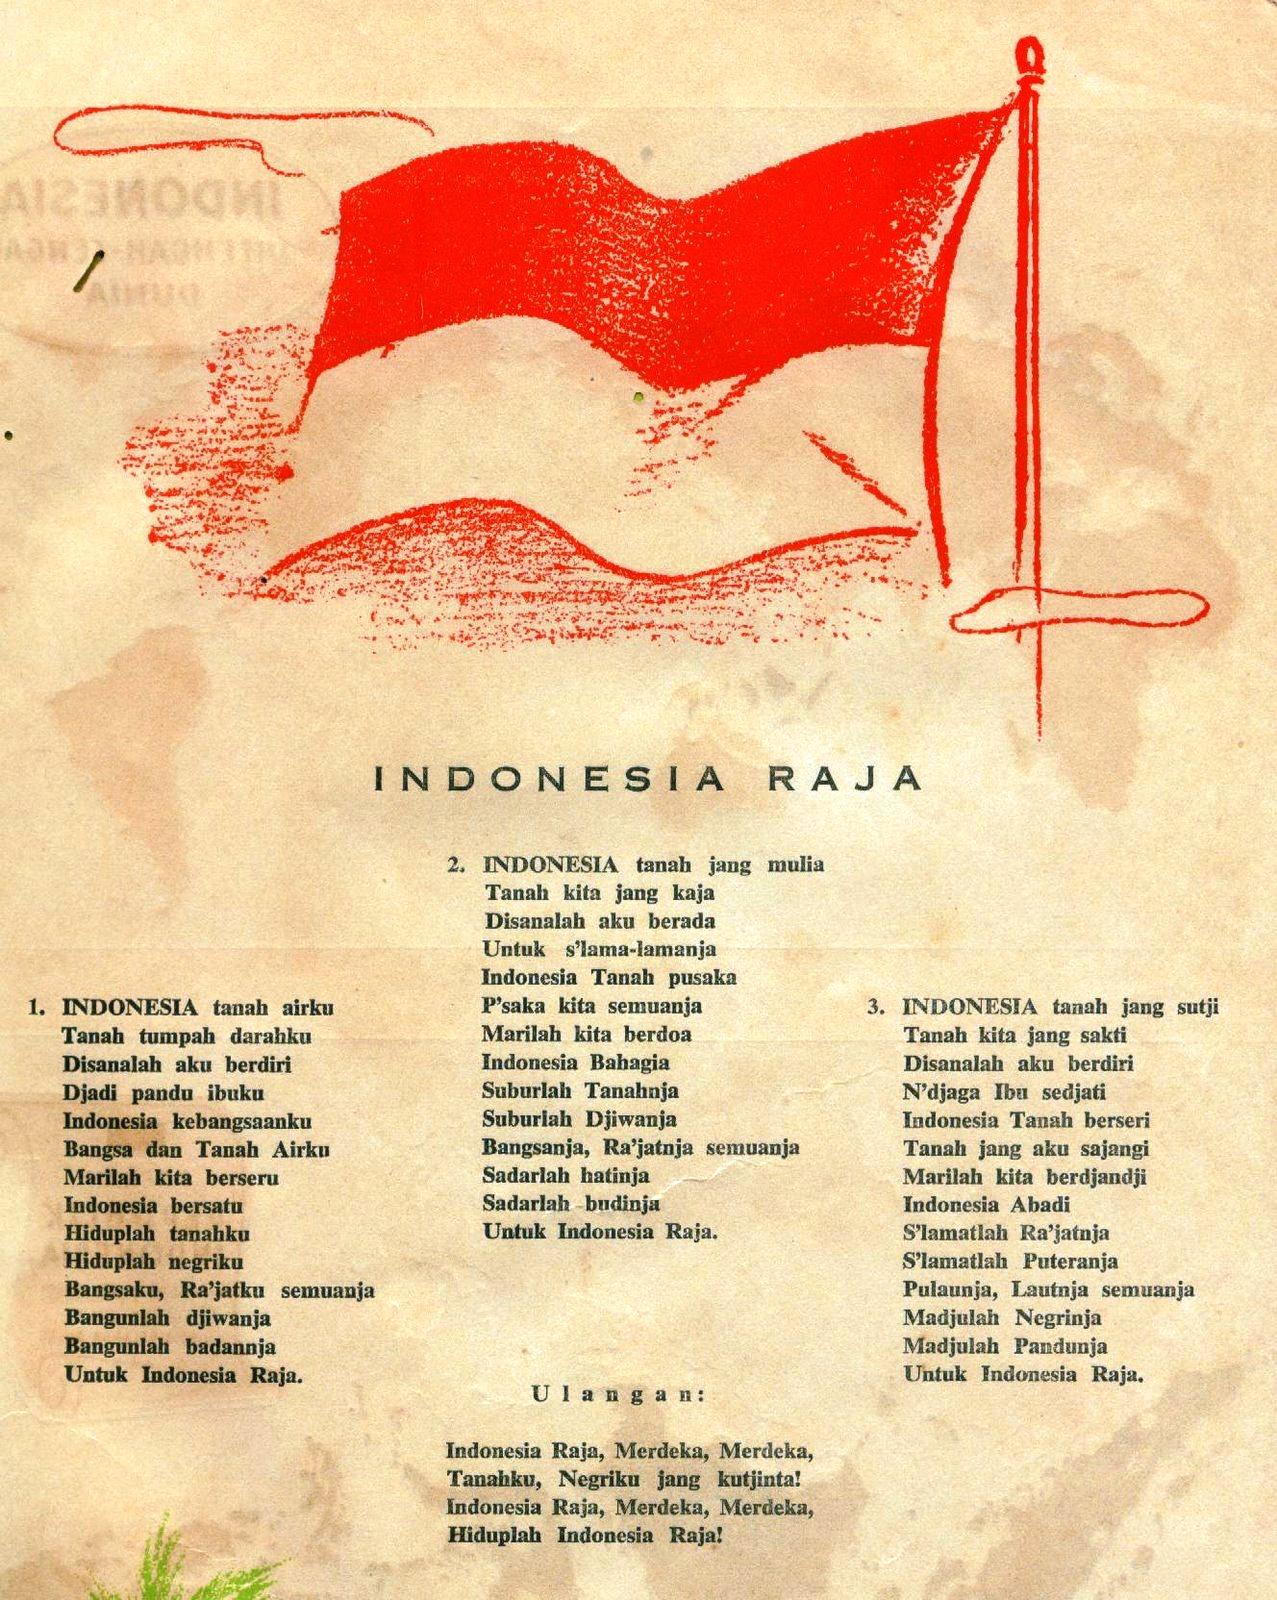 Lagu Indonesia Raya 3 Stanza Brainly